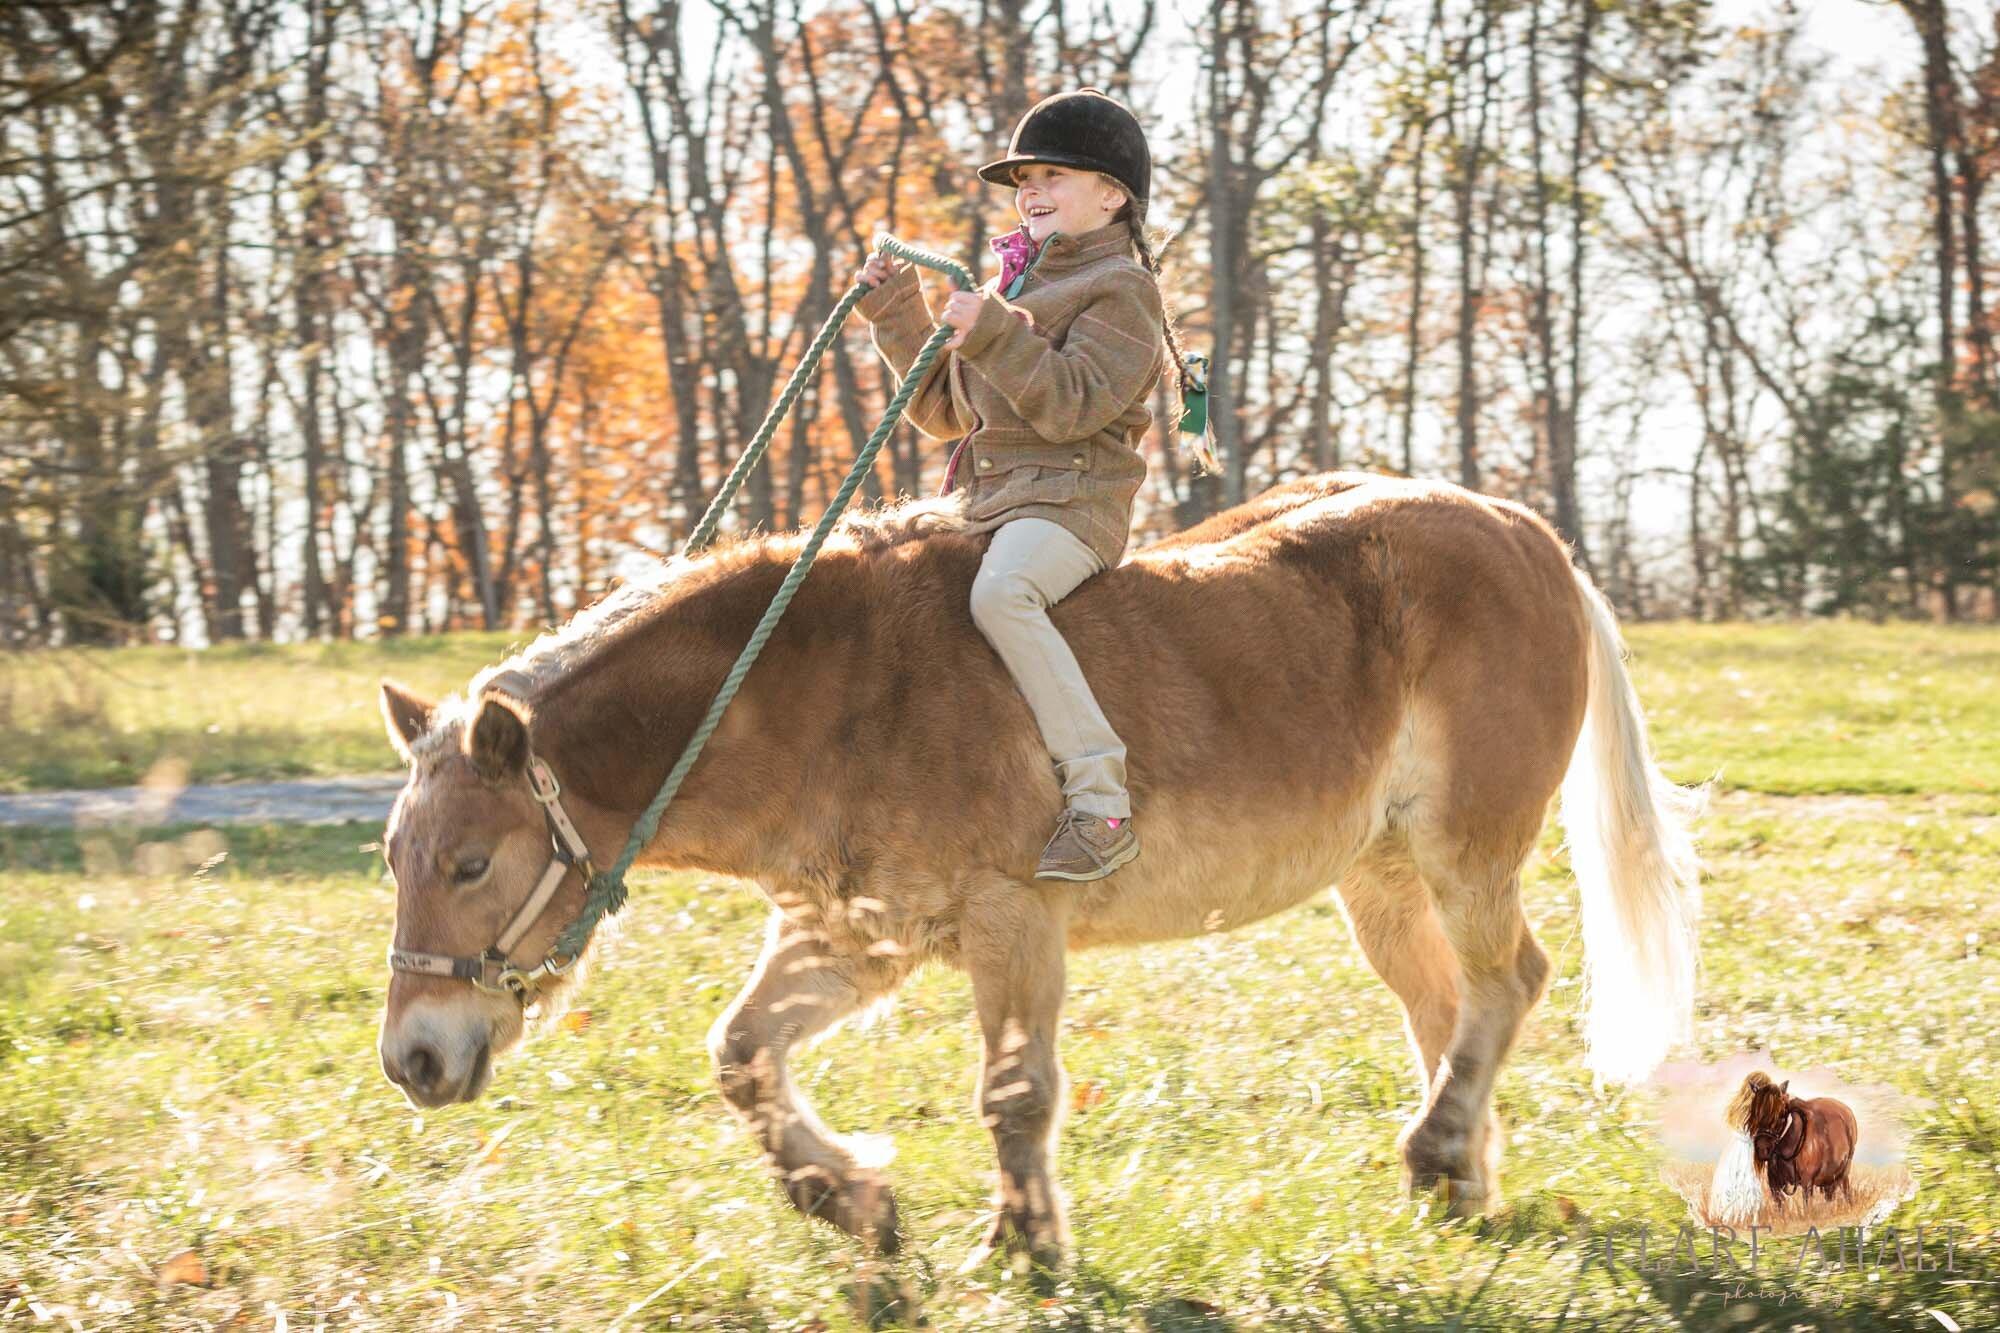 equine_photographer_potomac_md_equine_photographer_middleburg_VA_equine_portraiture_loudon_county_VA-9968.jpg